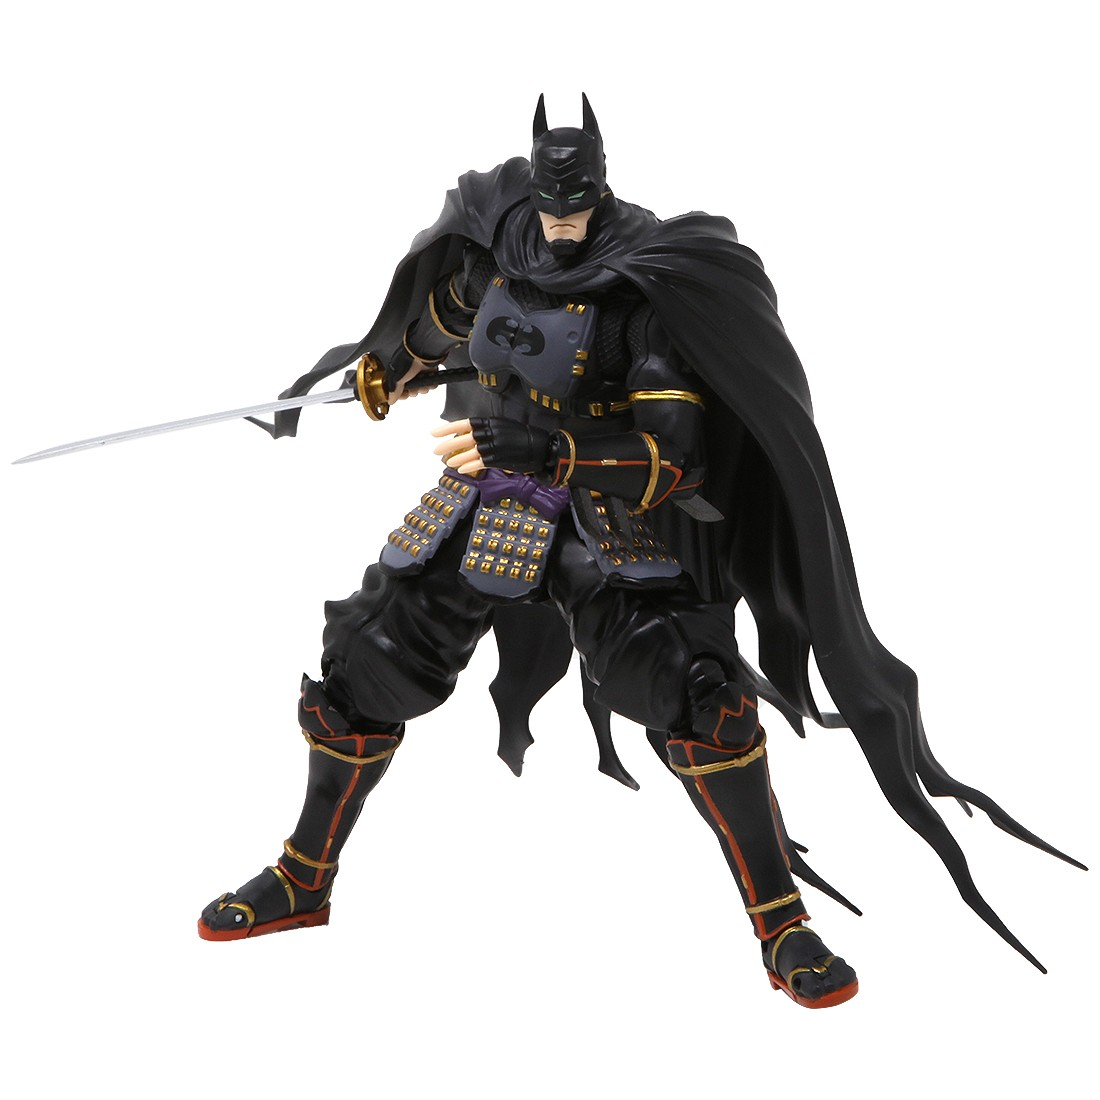 Bandai S.H.Figuarts Ninja Batman Figure (black)